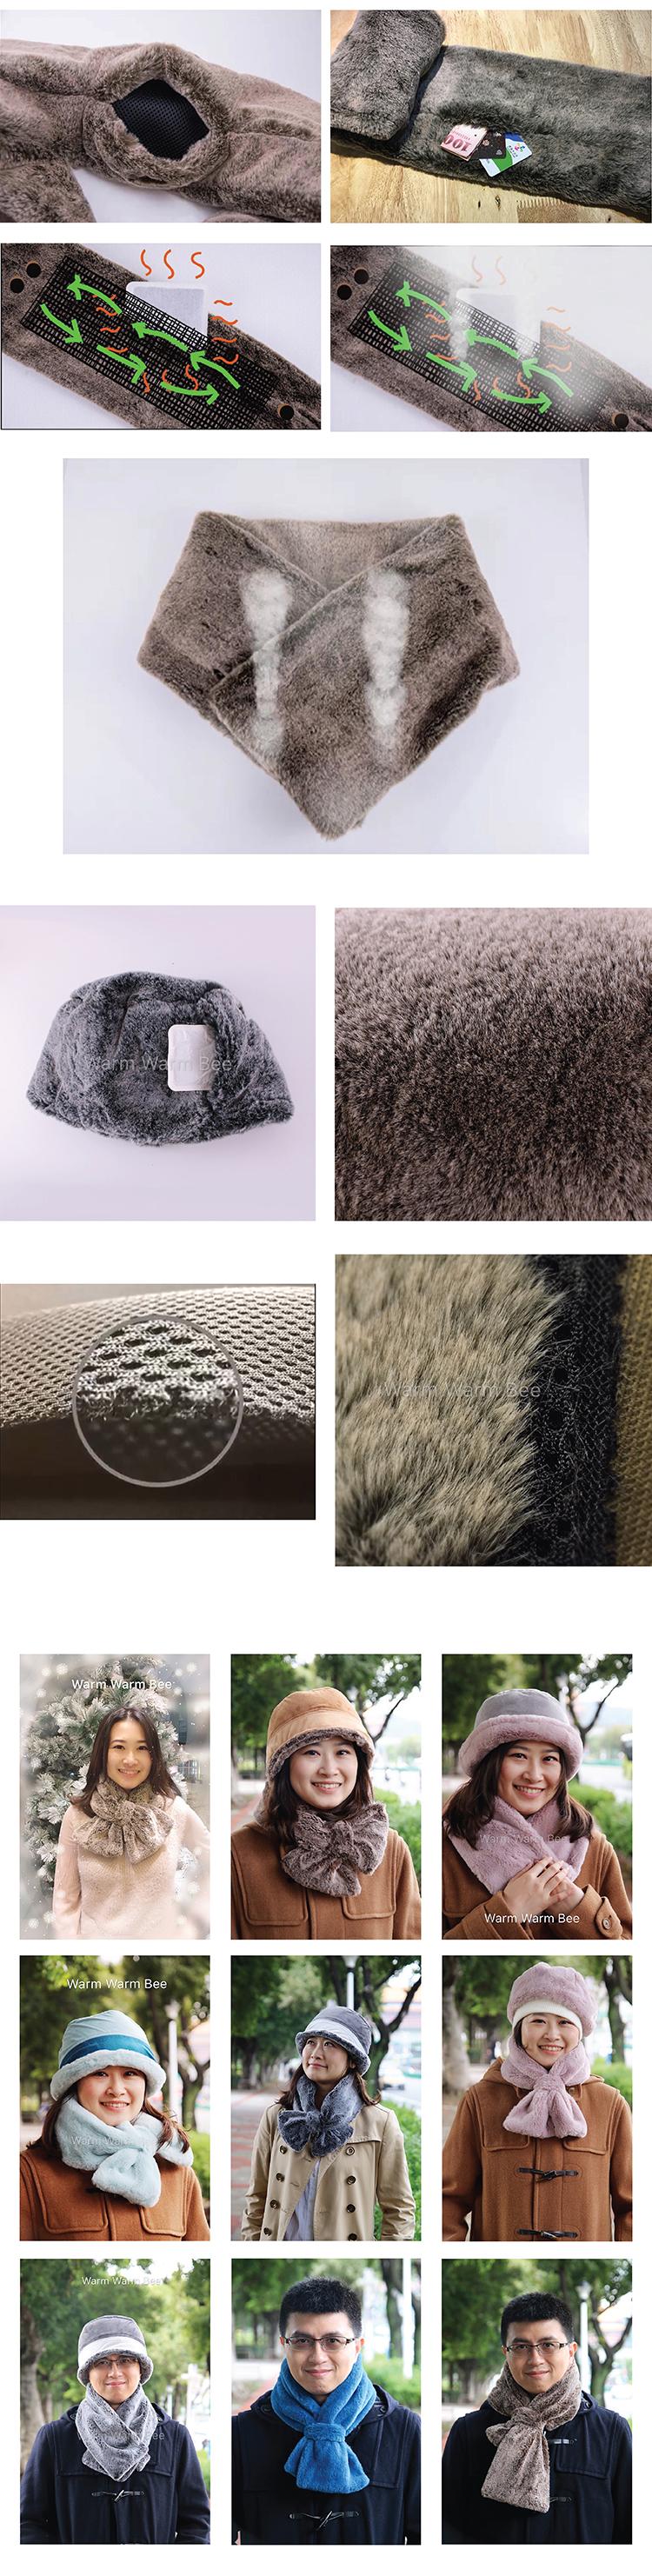 Patent Winter Sjaal Fabrikant met Wegwerp Warmte Pak